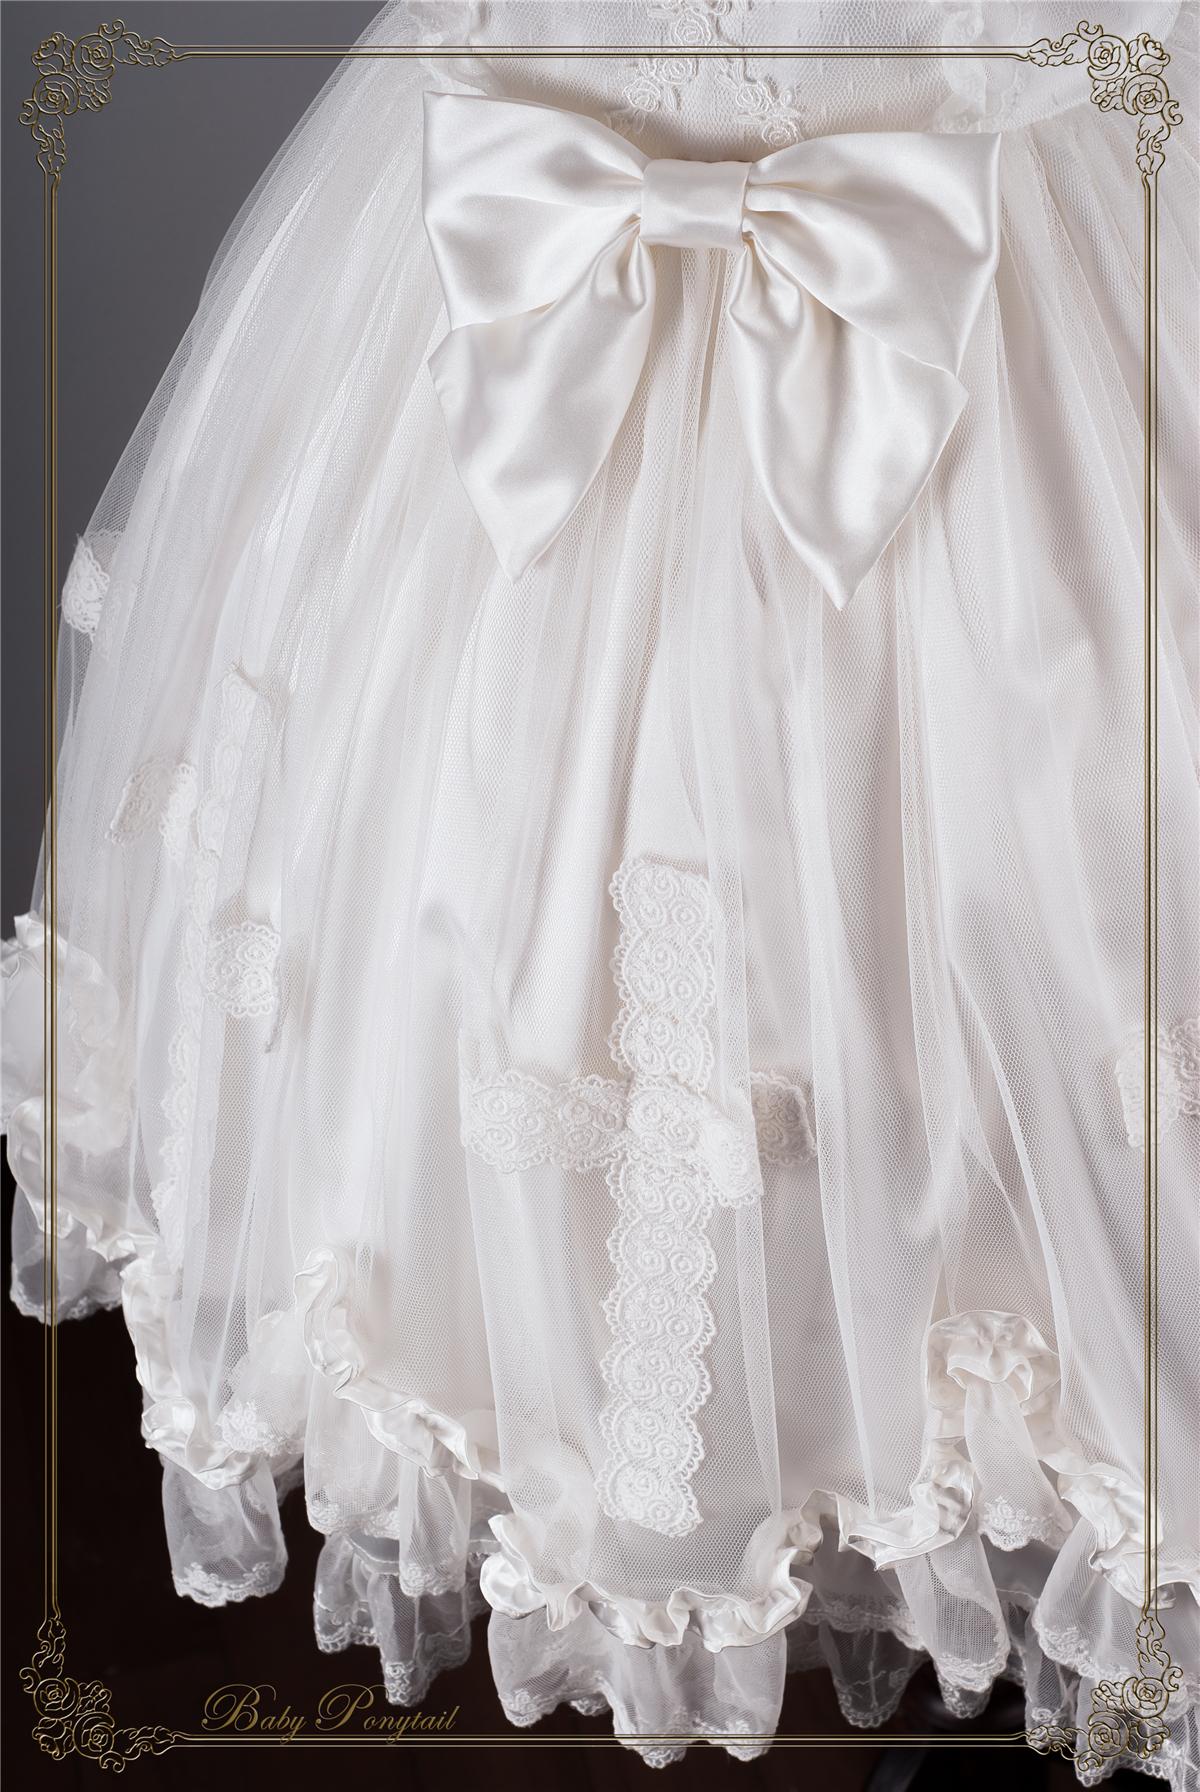 Babyponytail_Heavenly Teardrops_JSK White Stock Photo_06.jpg